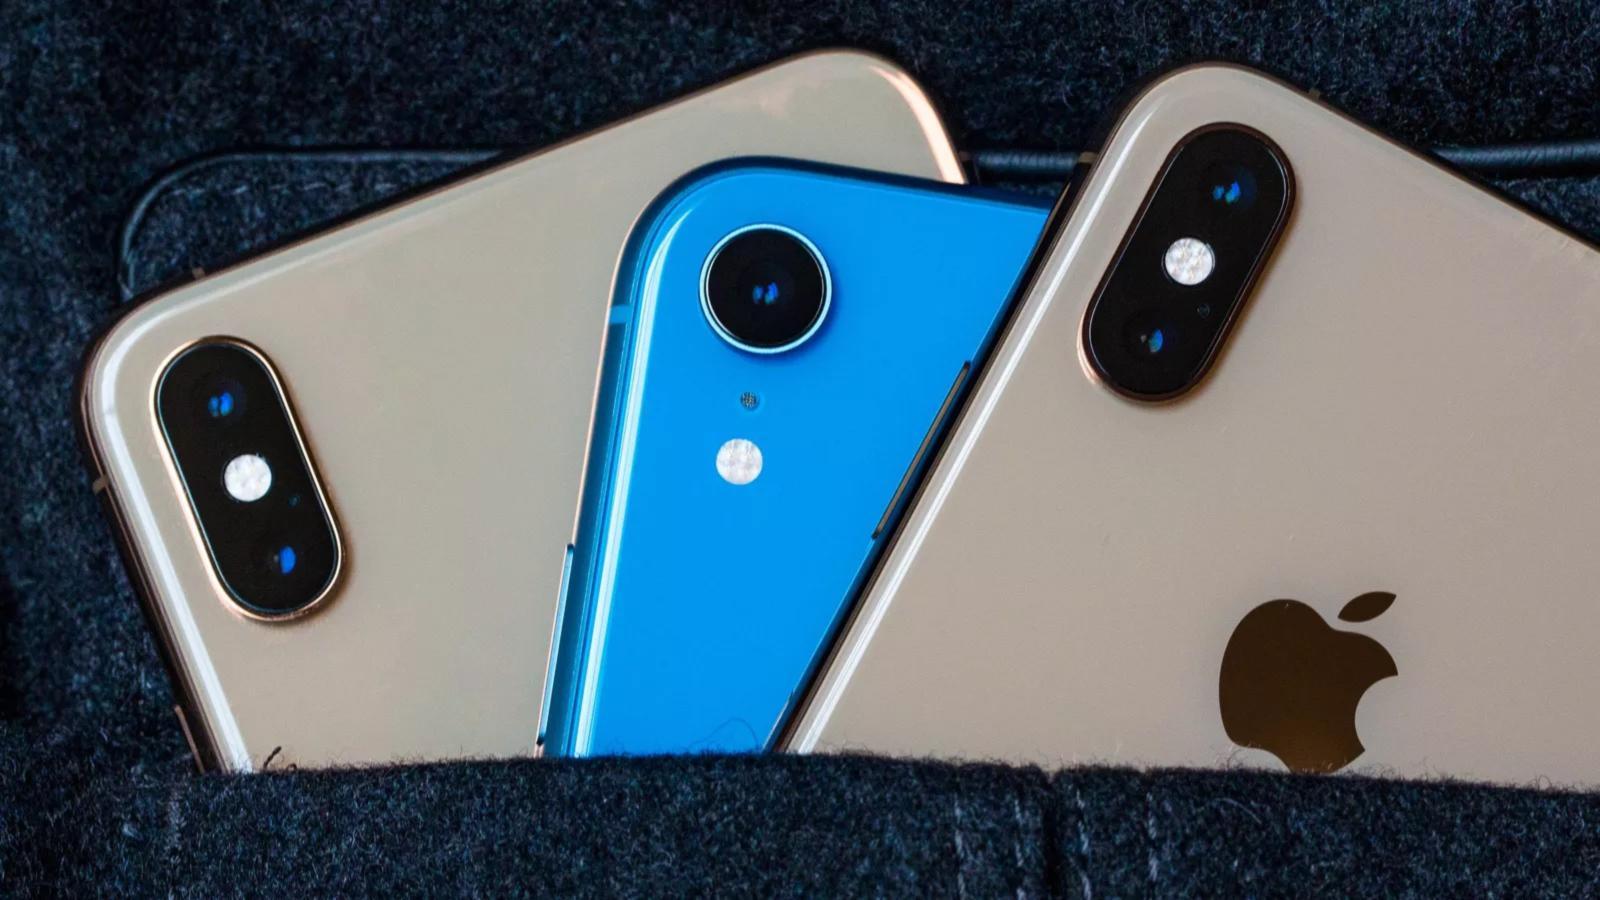 Come sapere quali app consumano batteria iPhone 11